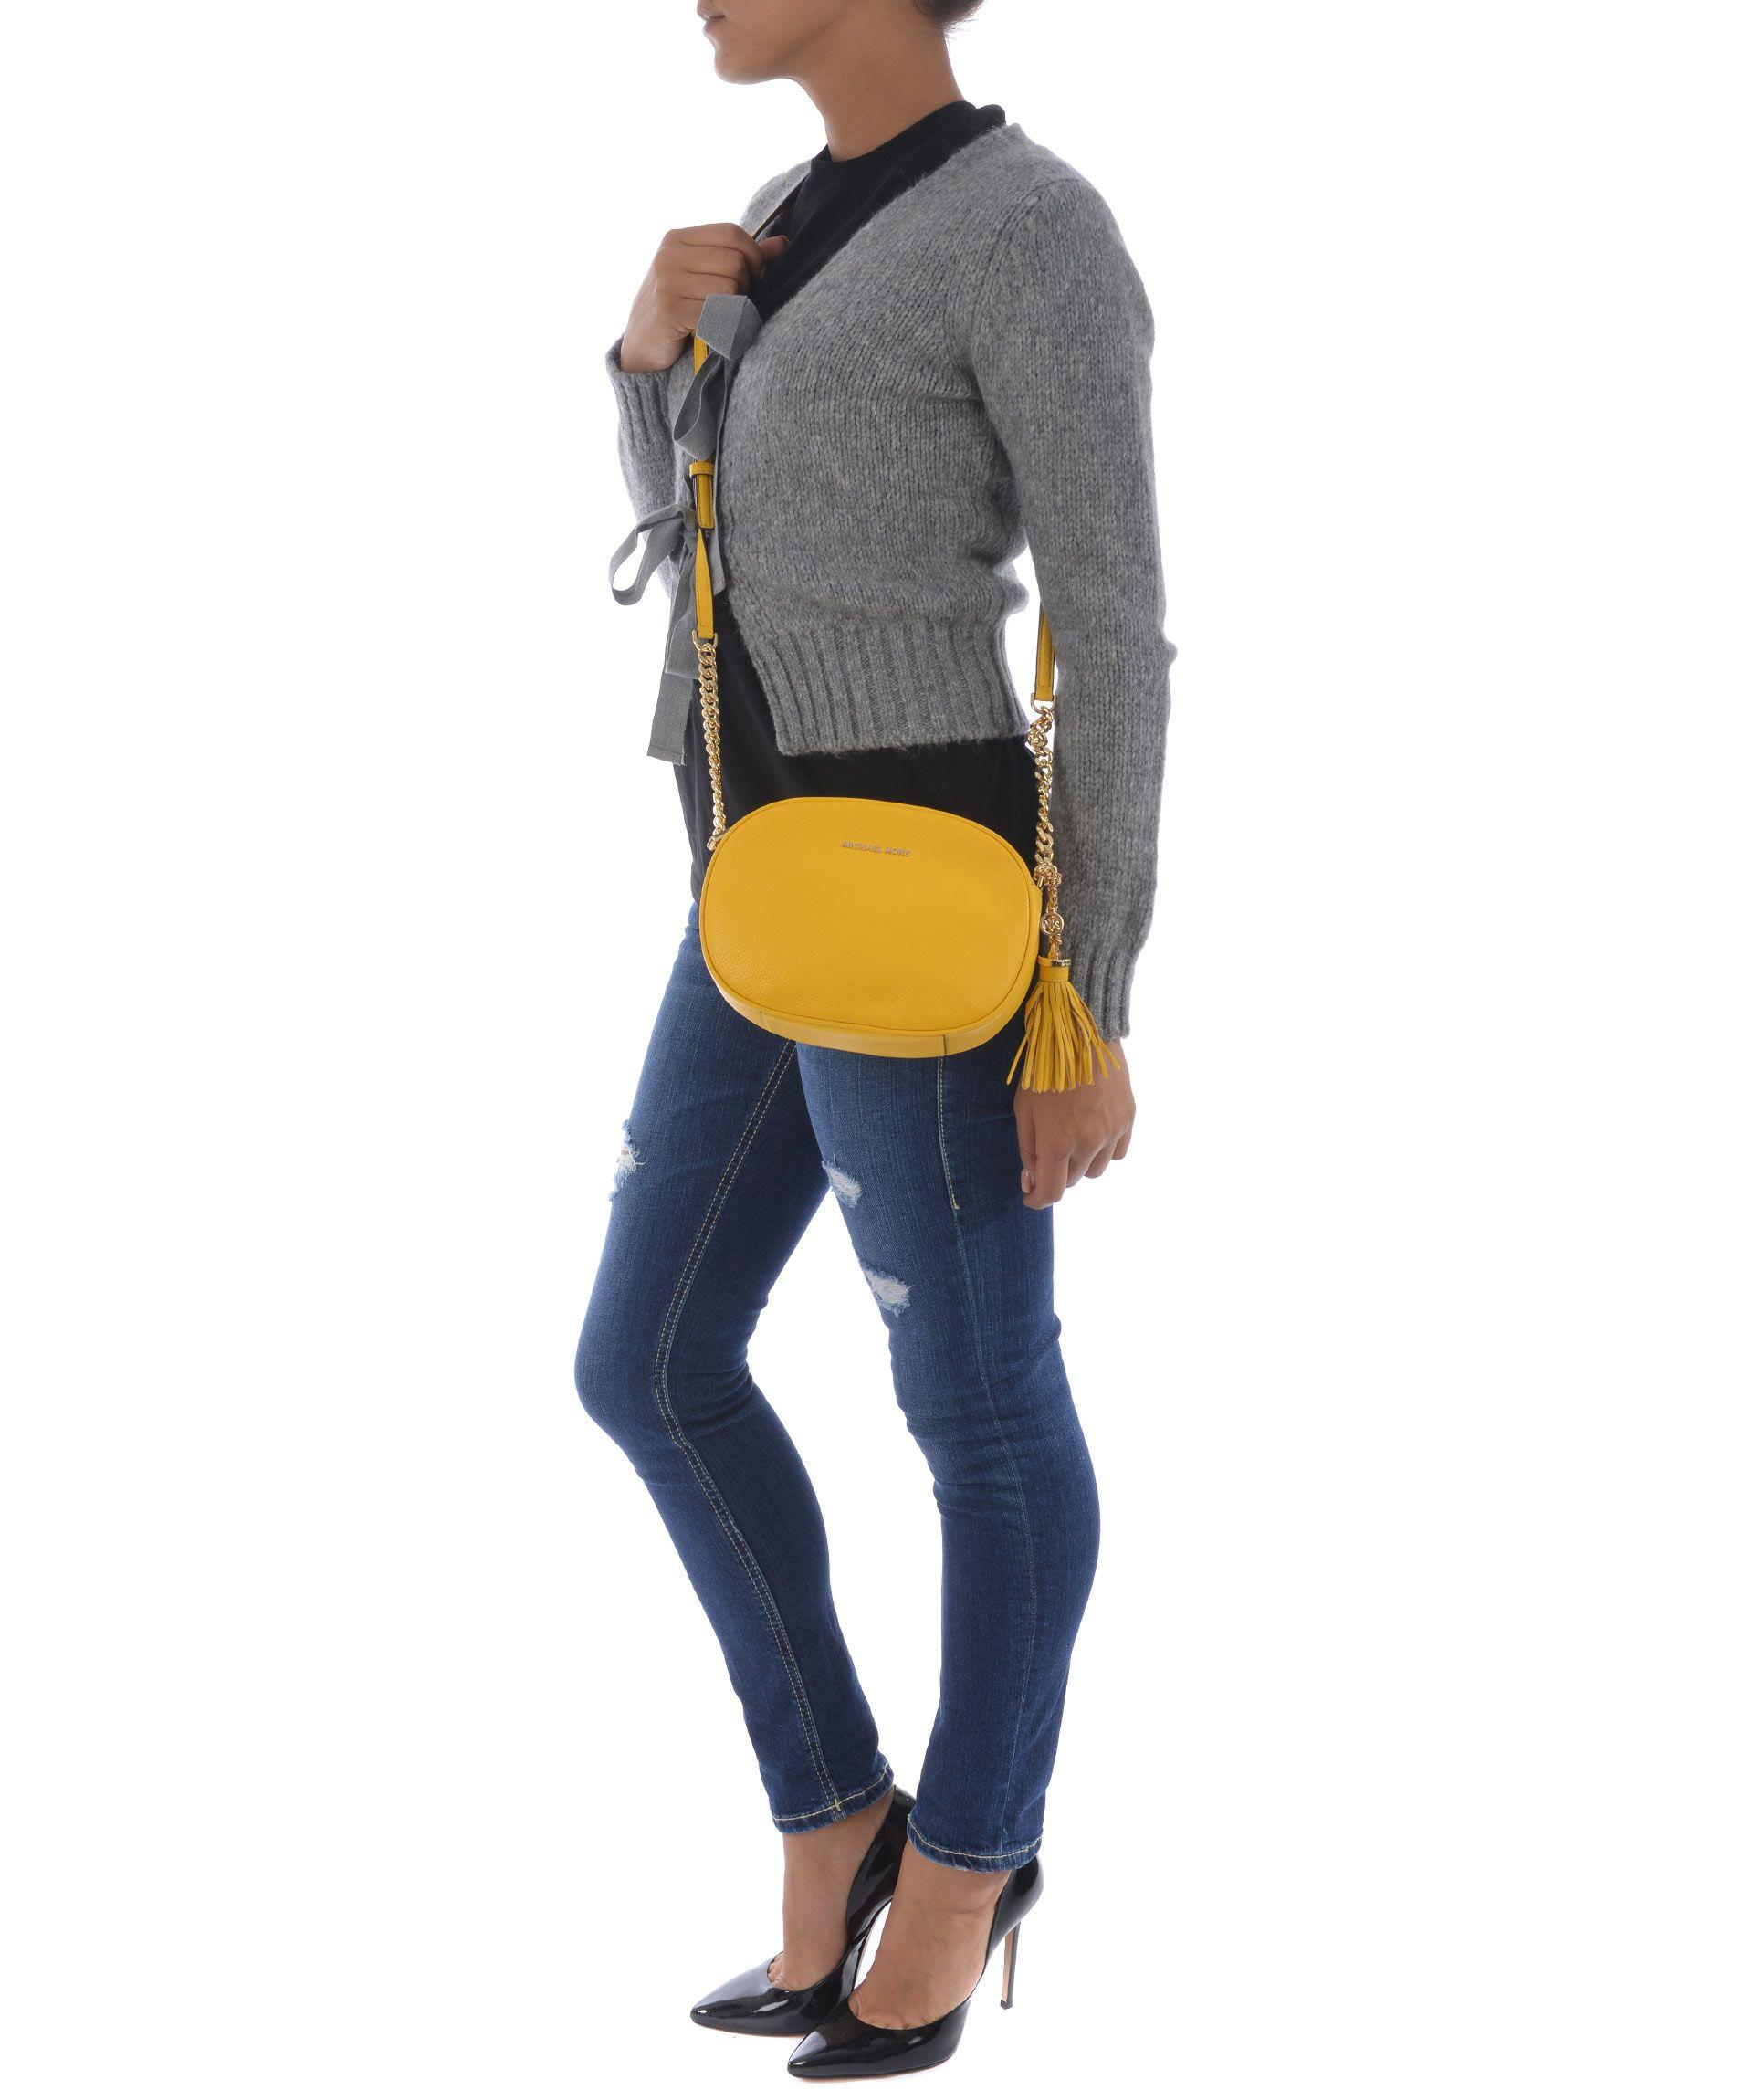 Michael Kors Ginny Medium Shoulder Bag In Giallo